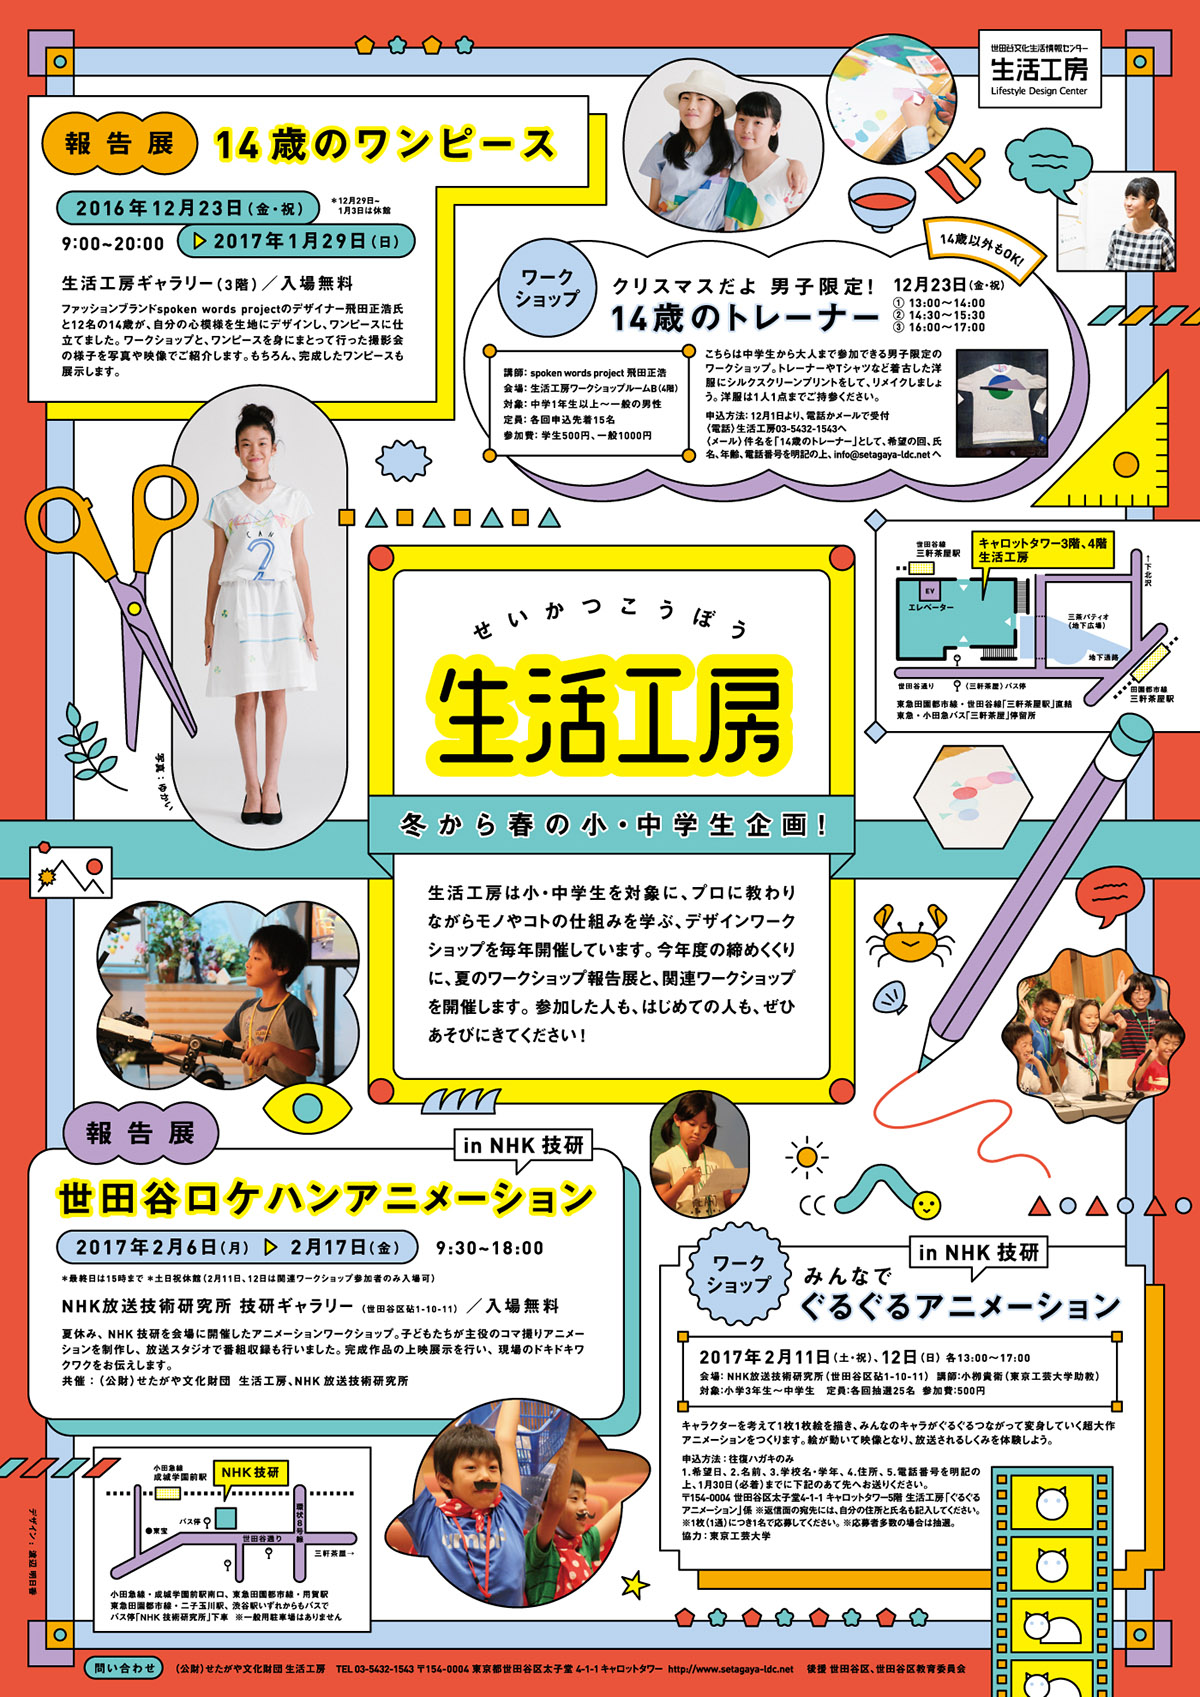 flyer examples - seikatsu kobo flyer